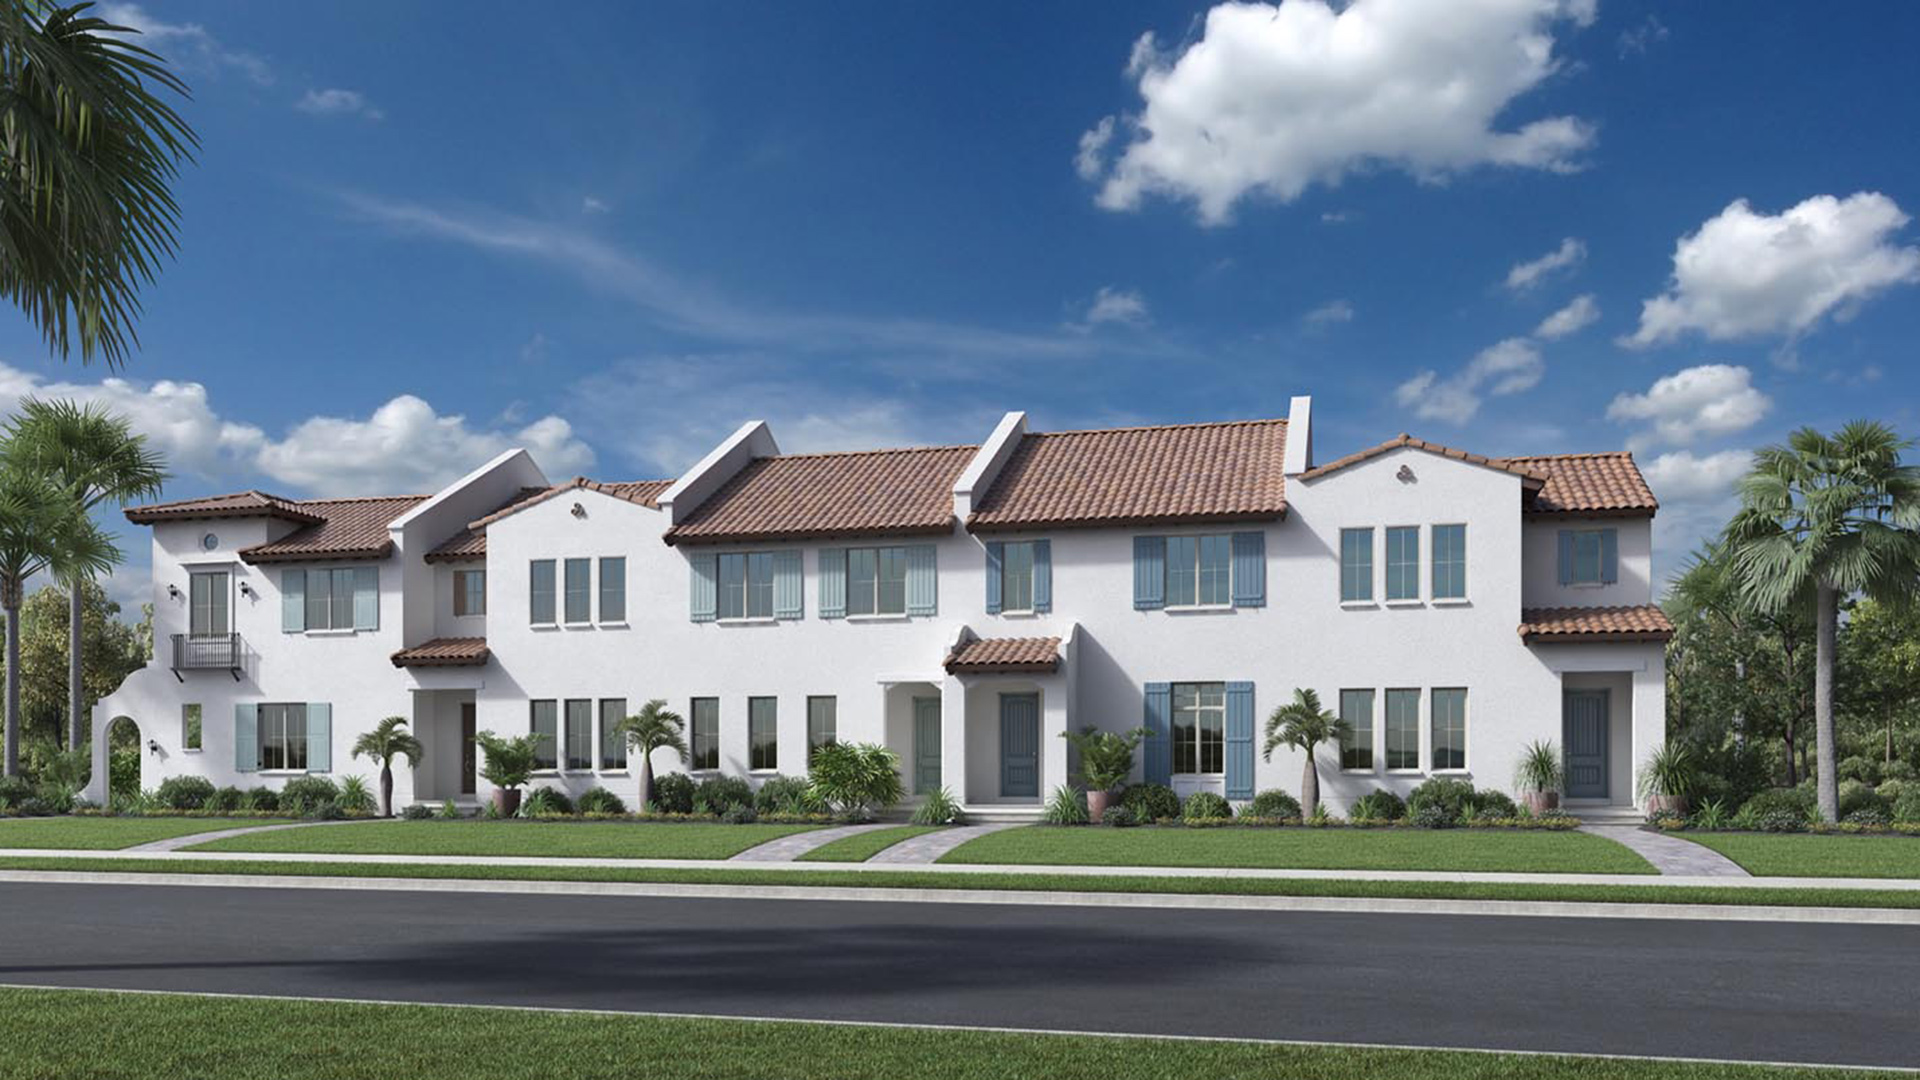 Lakeshore townhomes the dante home design for Lakeshore design builders